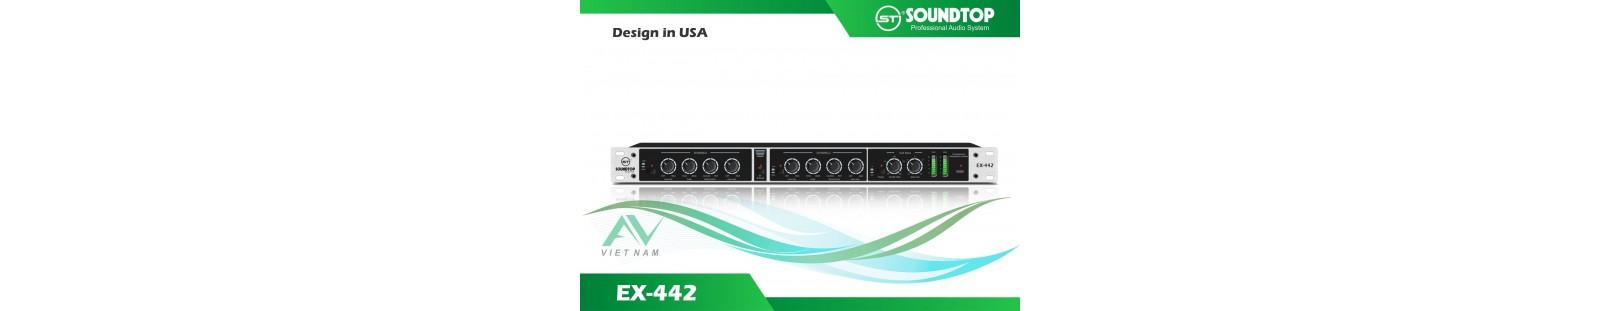 SOUNDTOP EX-442